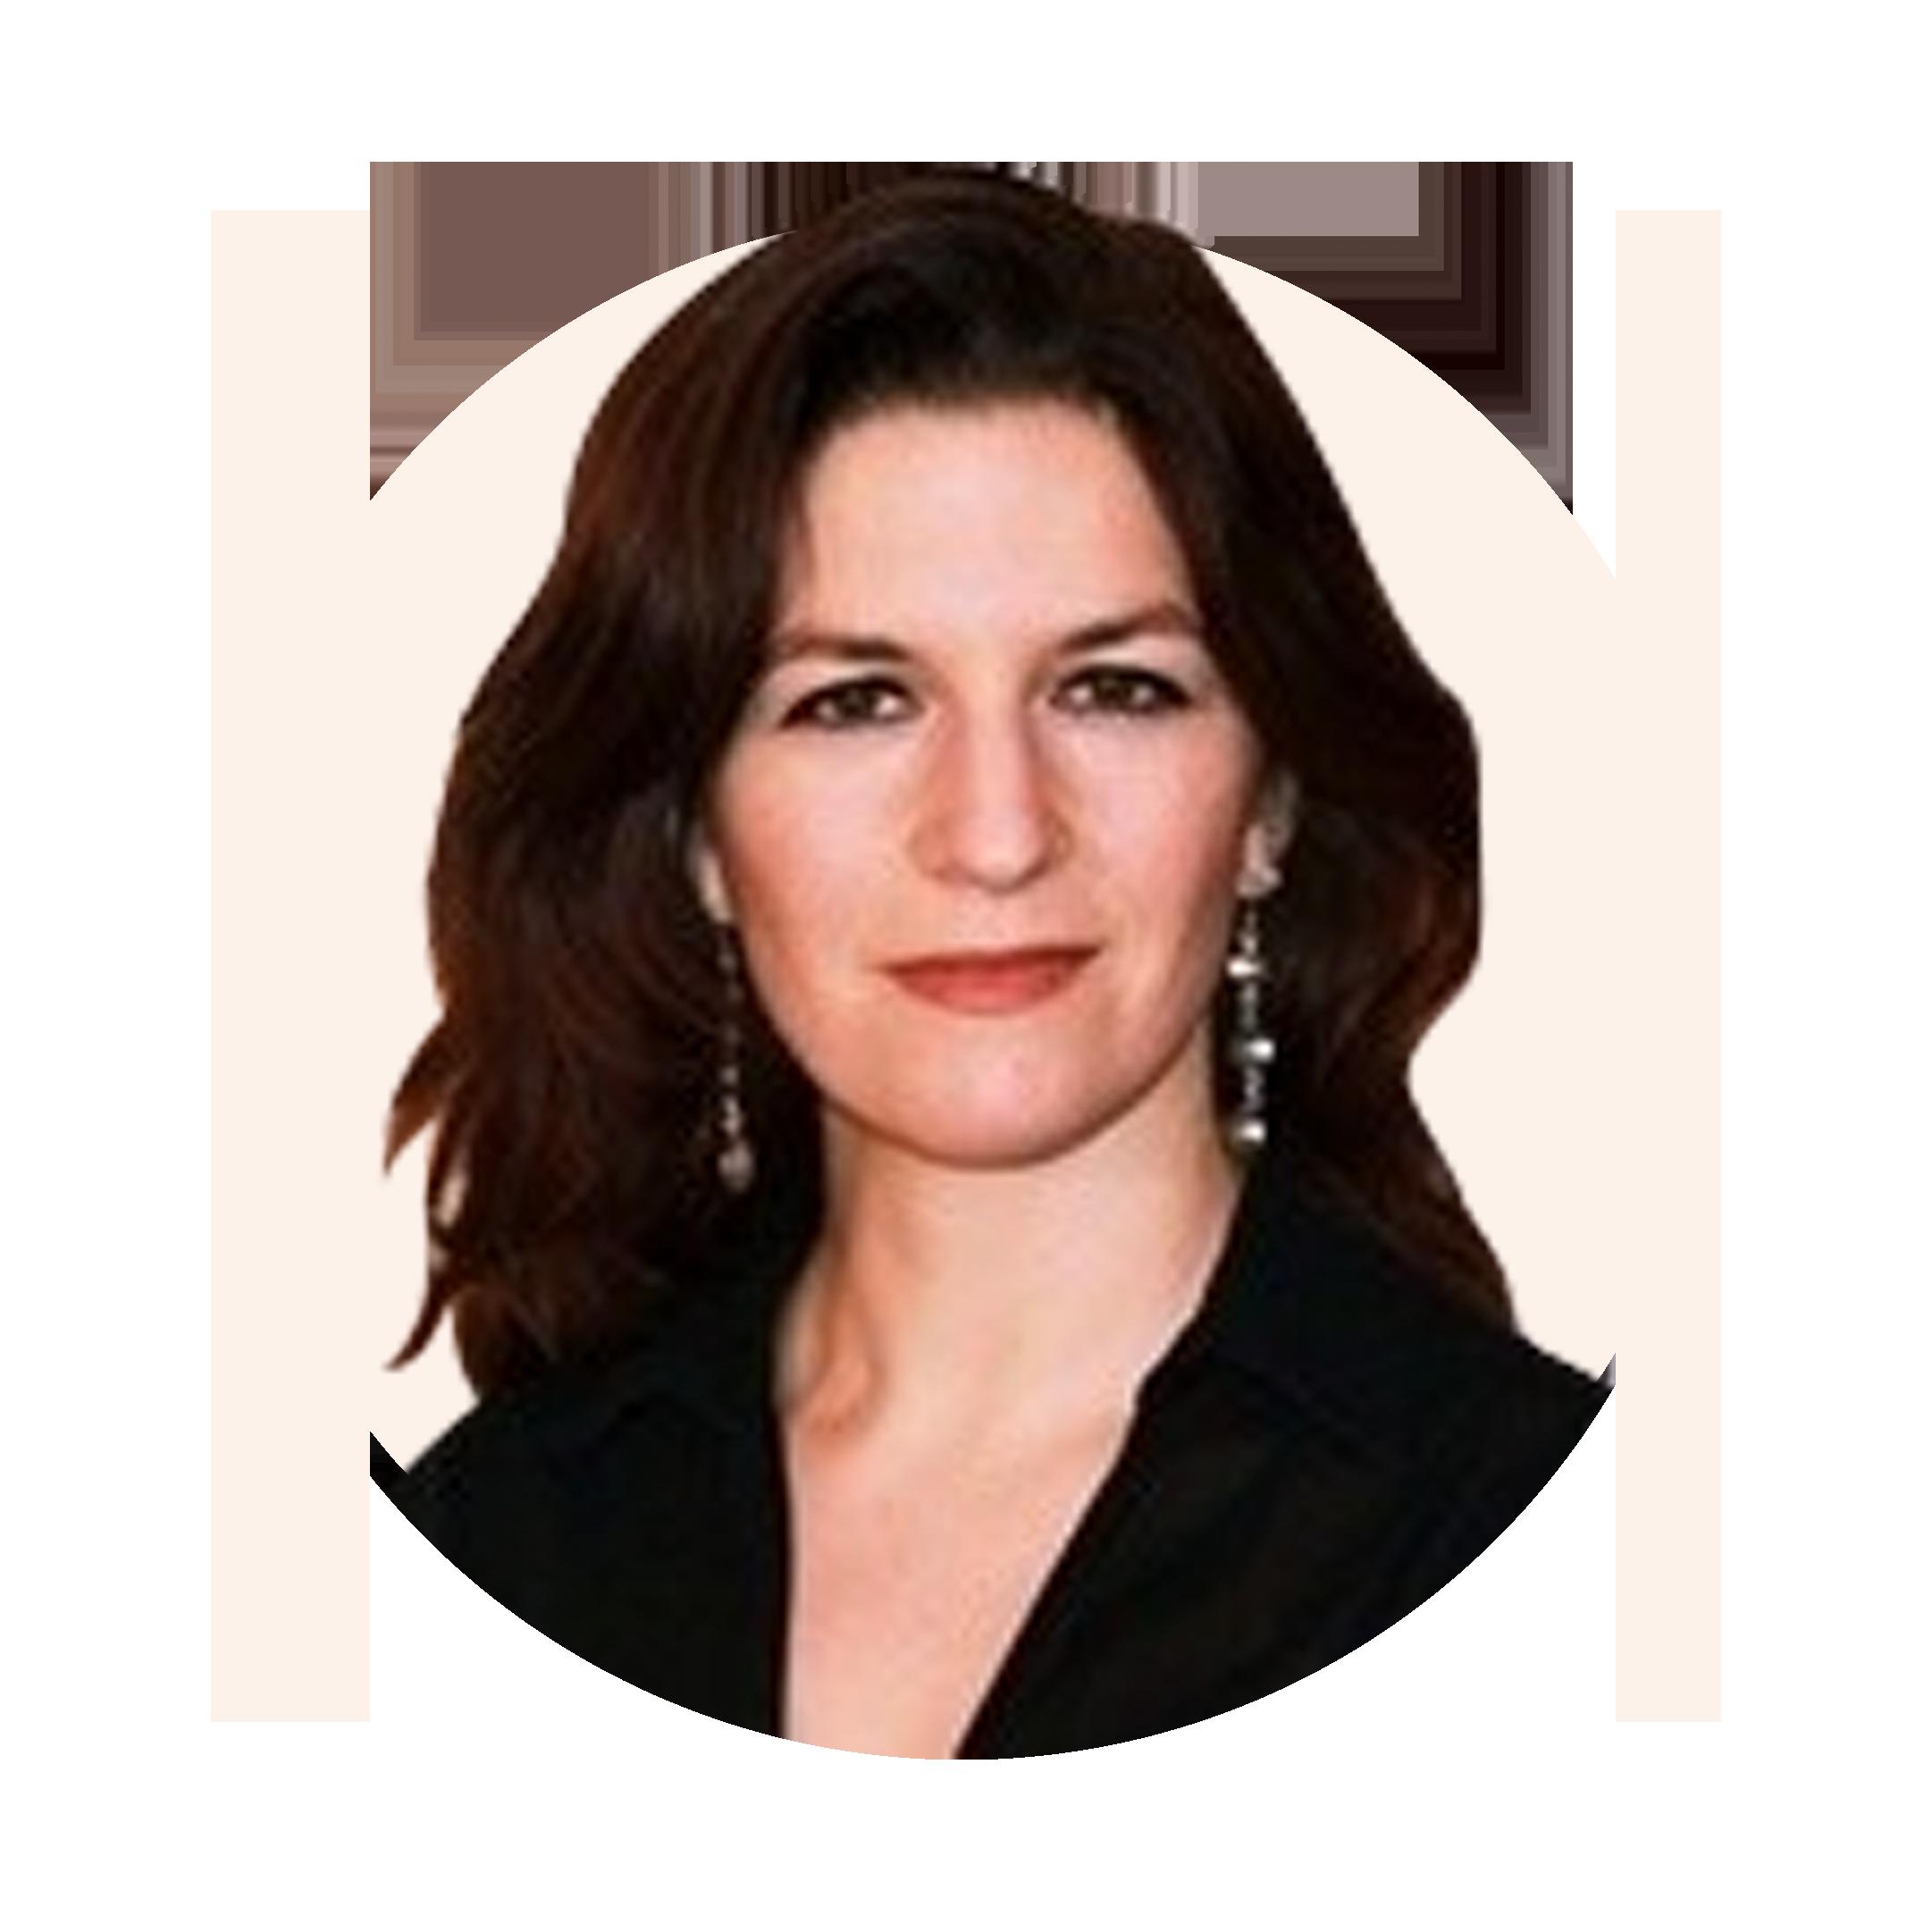 Sidekick profile Leah Mamou-Braitberg